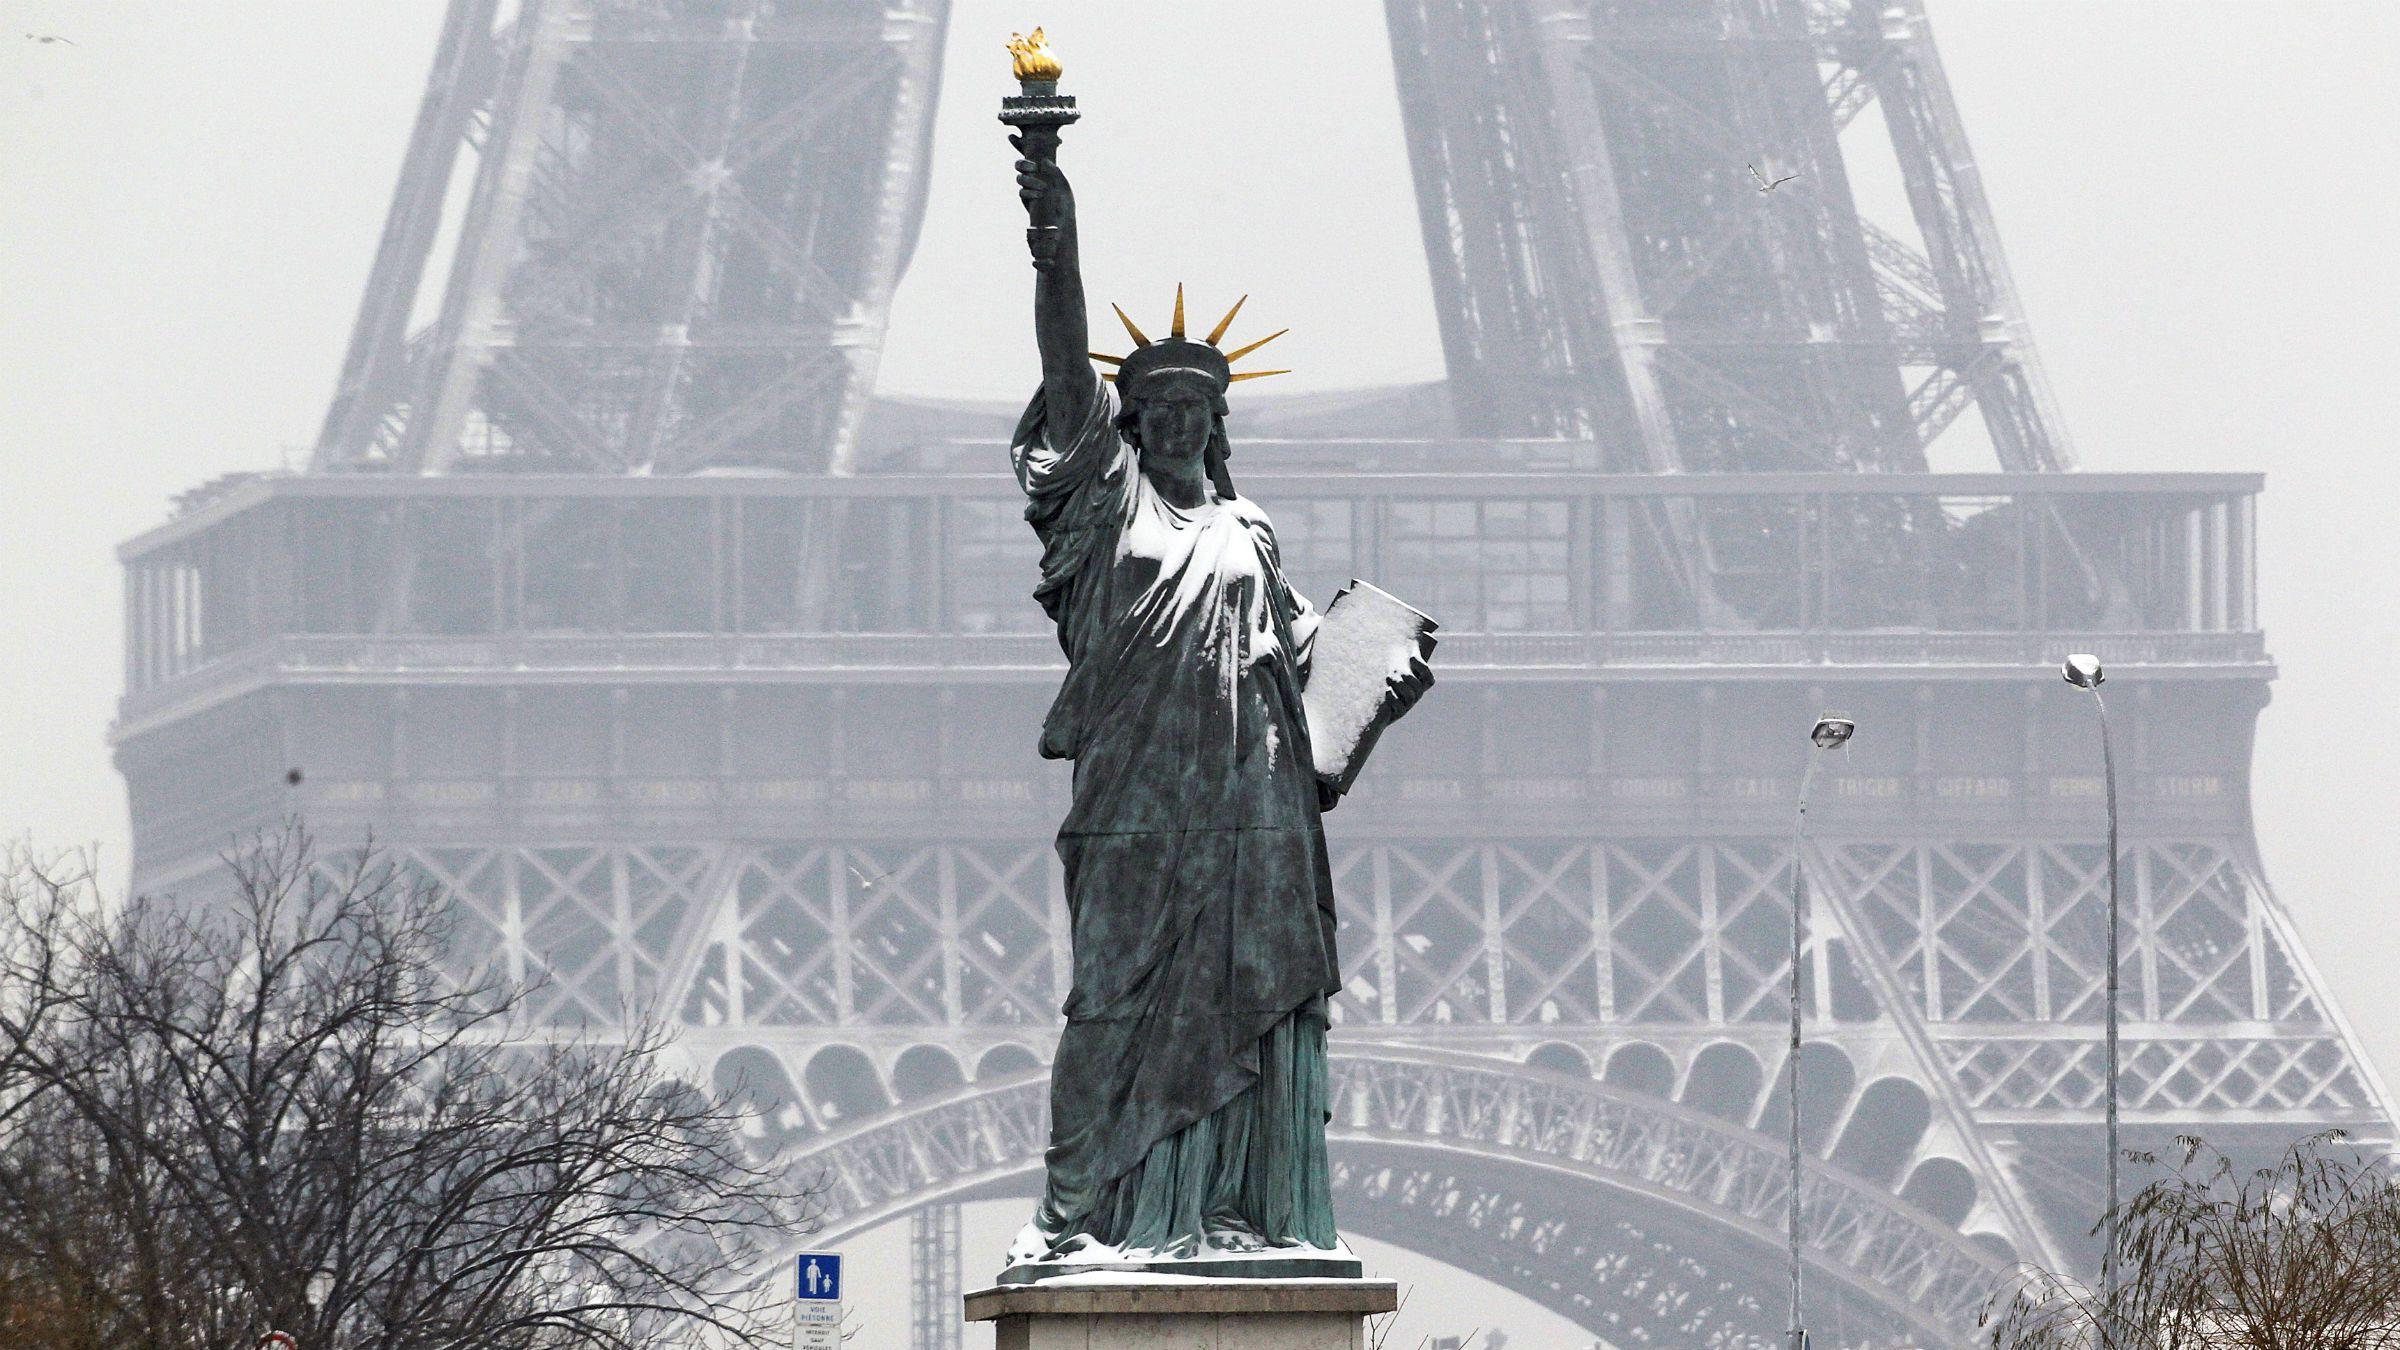 Statue of Liberty replica in Paris